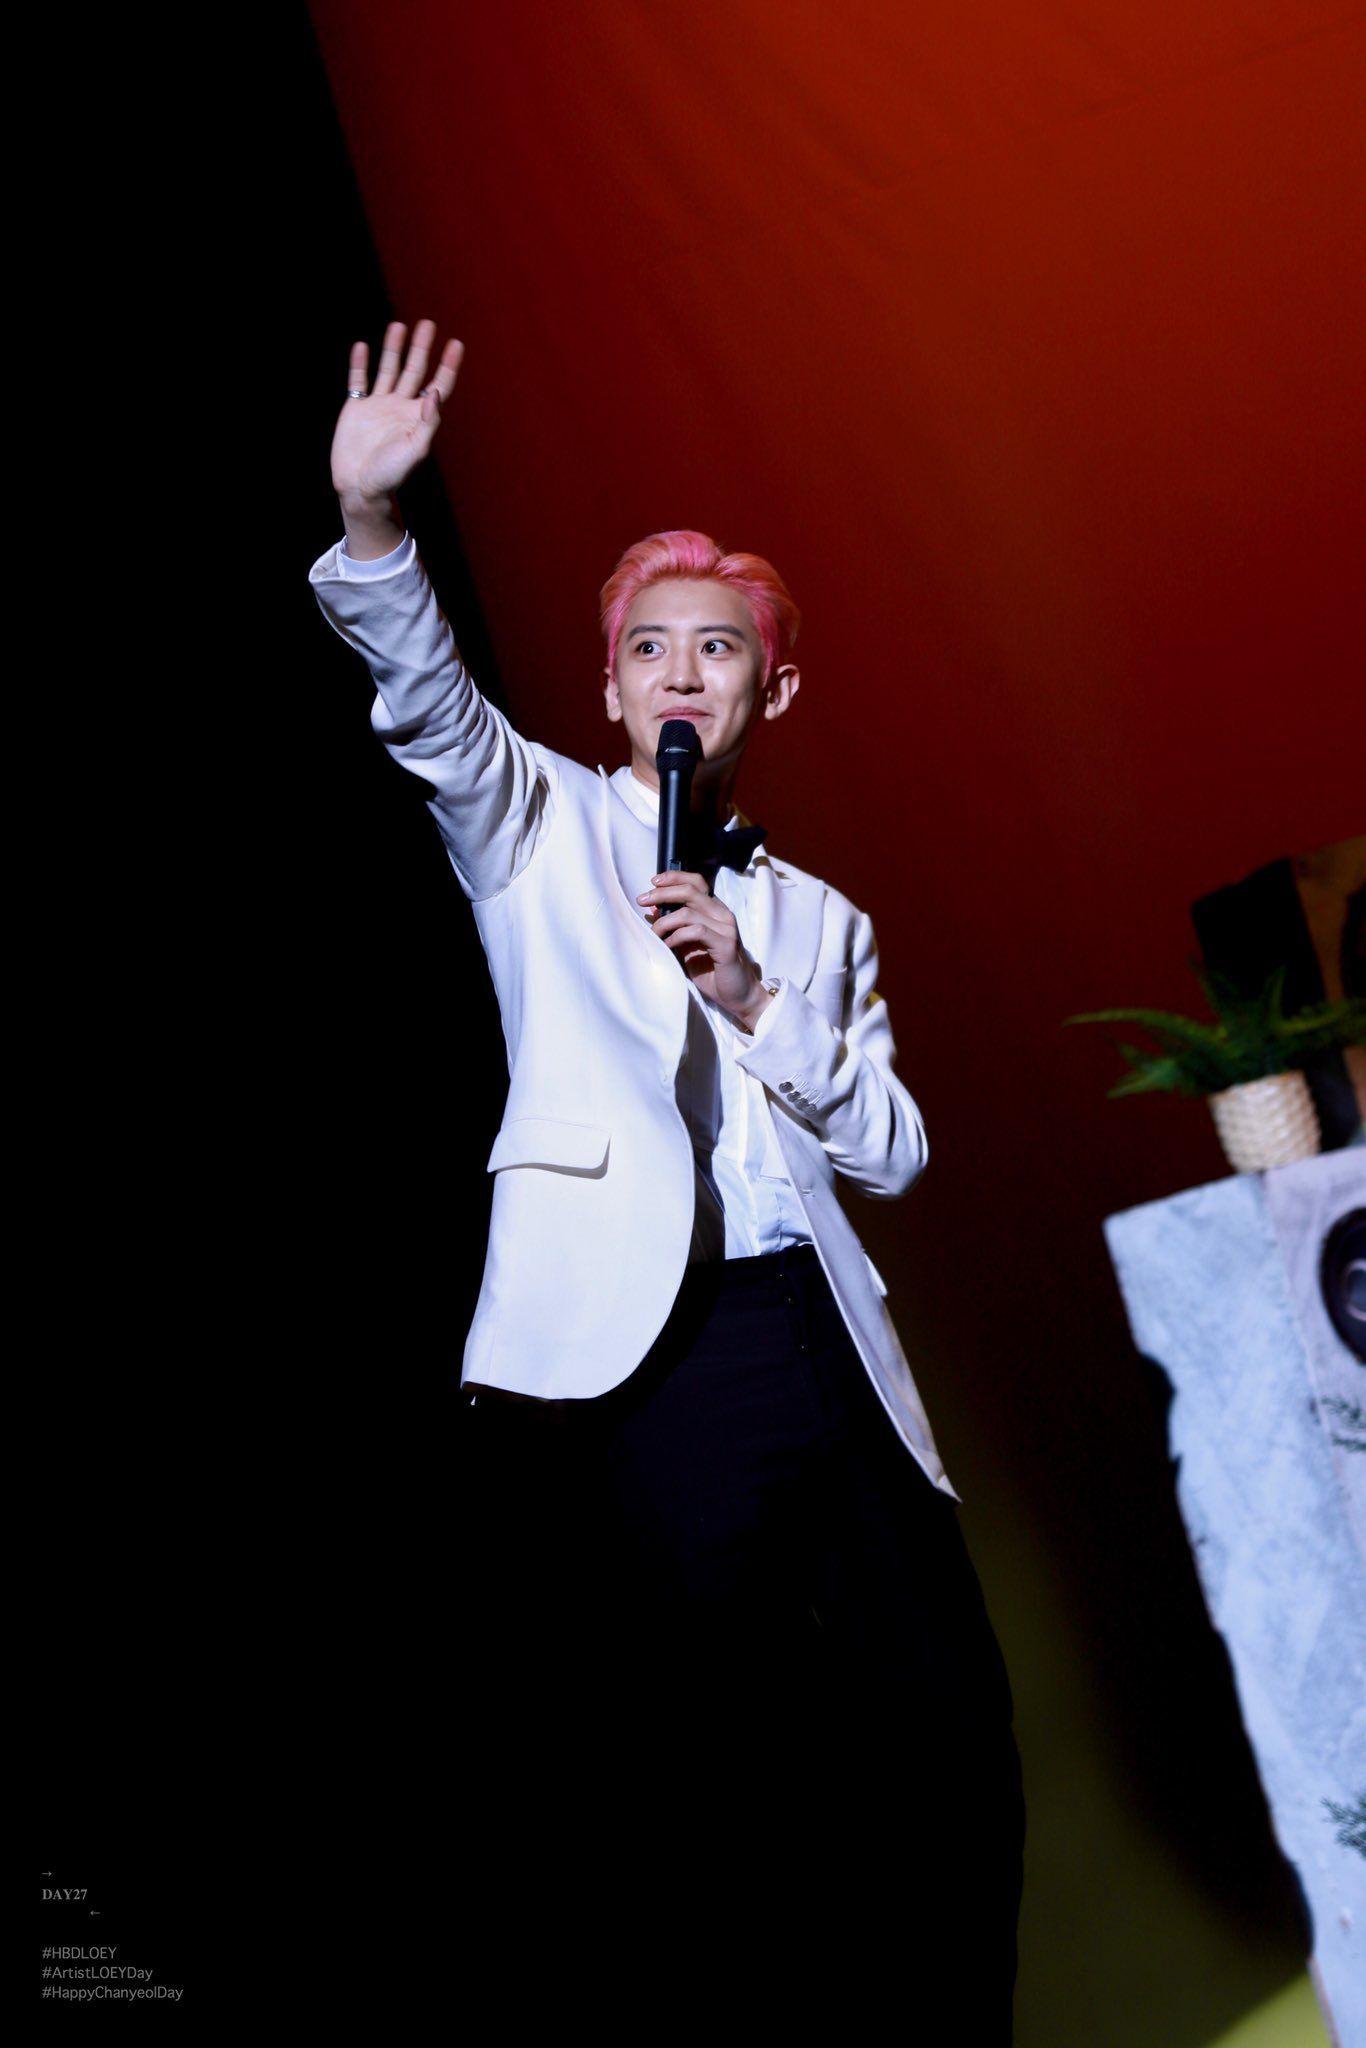 Chanyeol [HQ] 191126 Birthday Party EXO Chanyeol